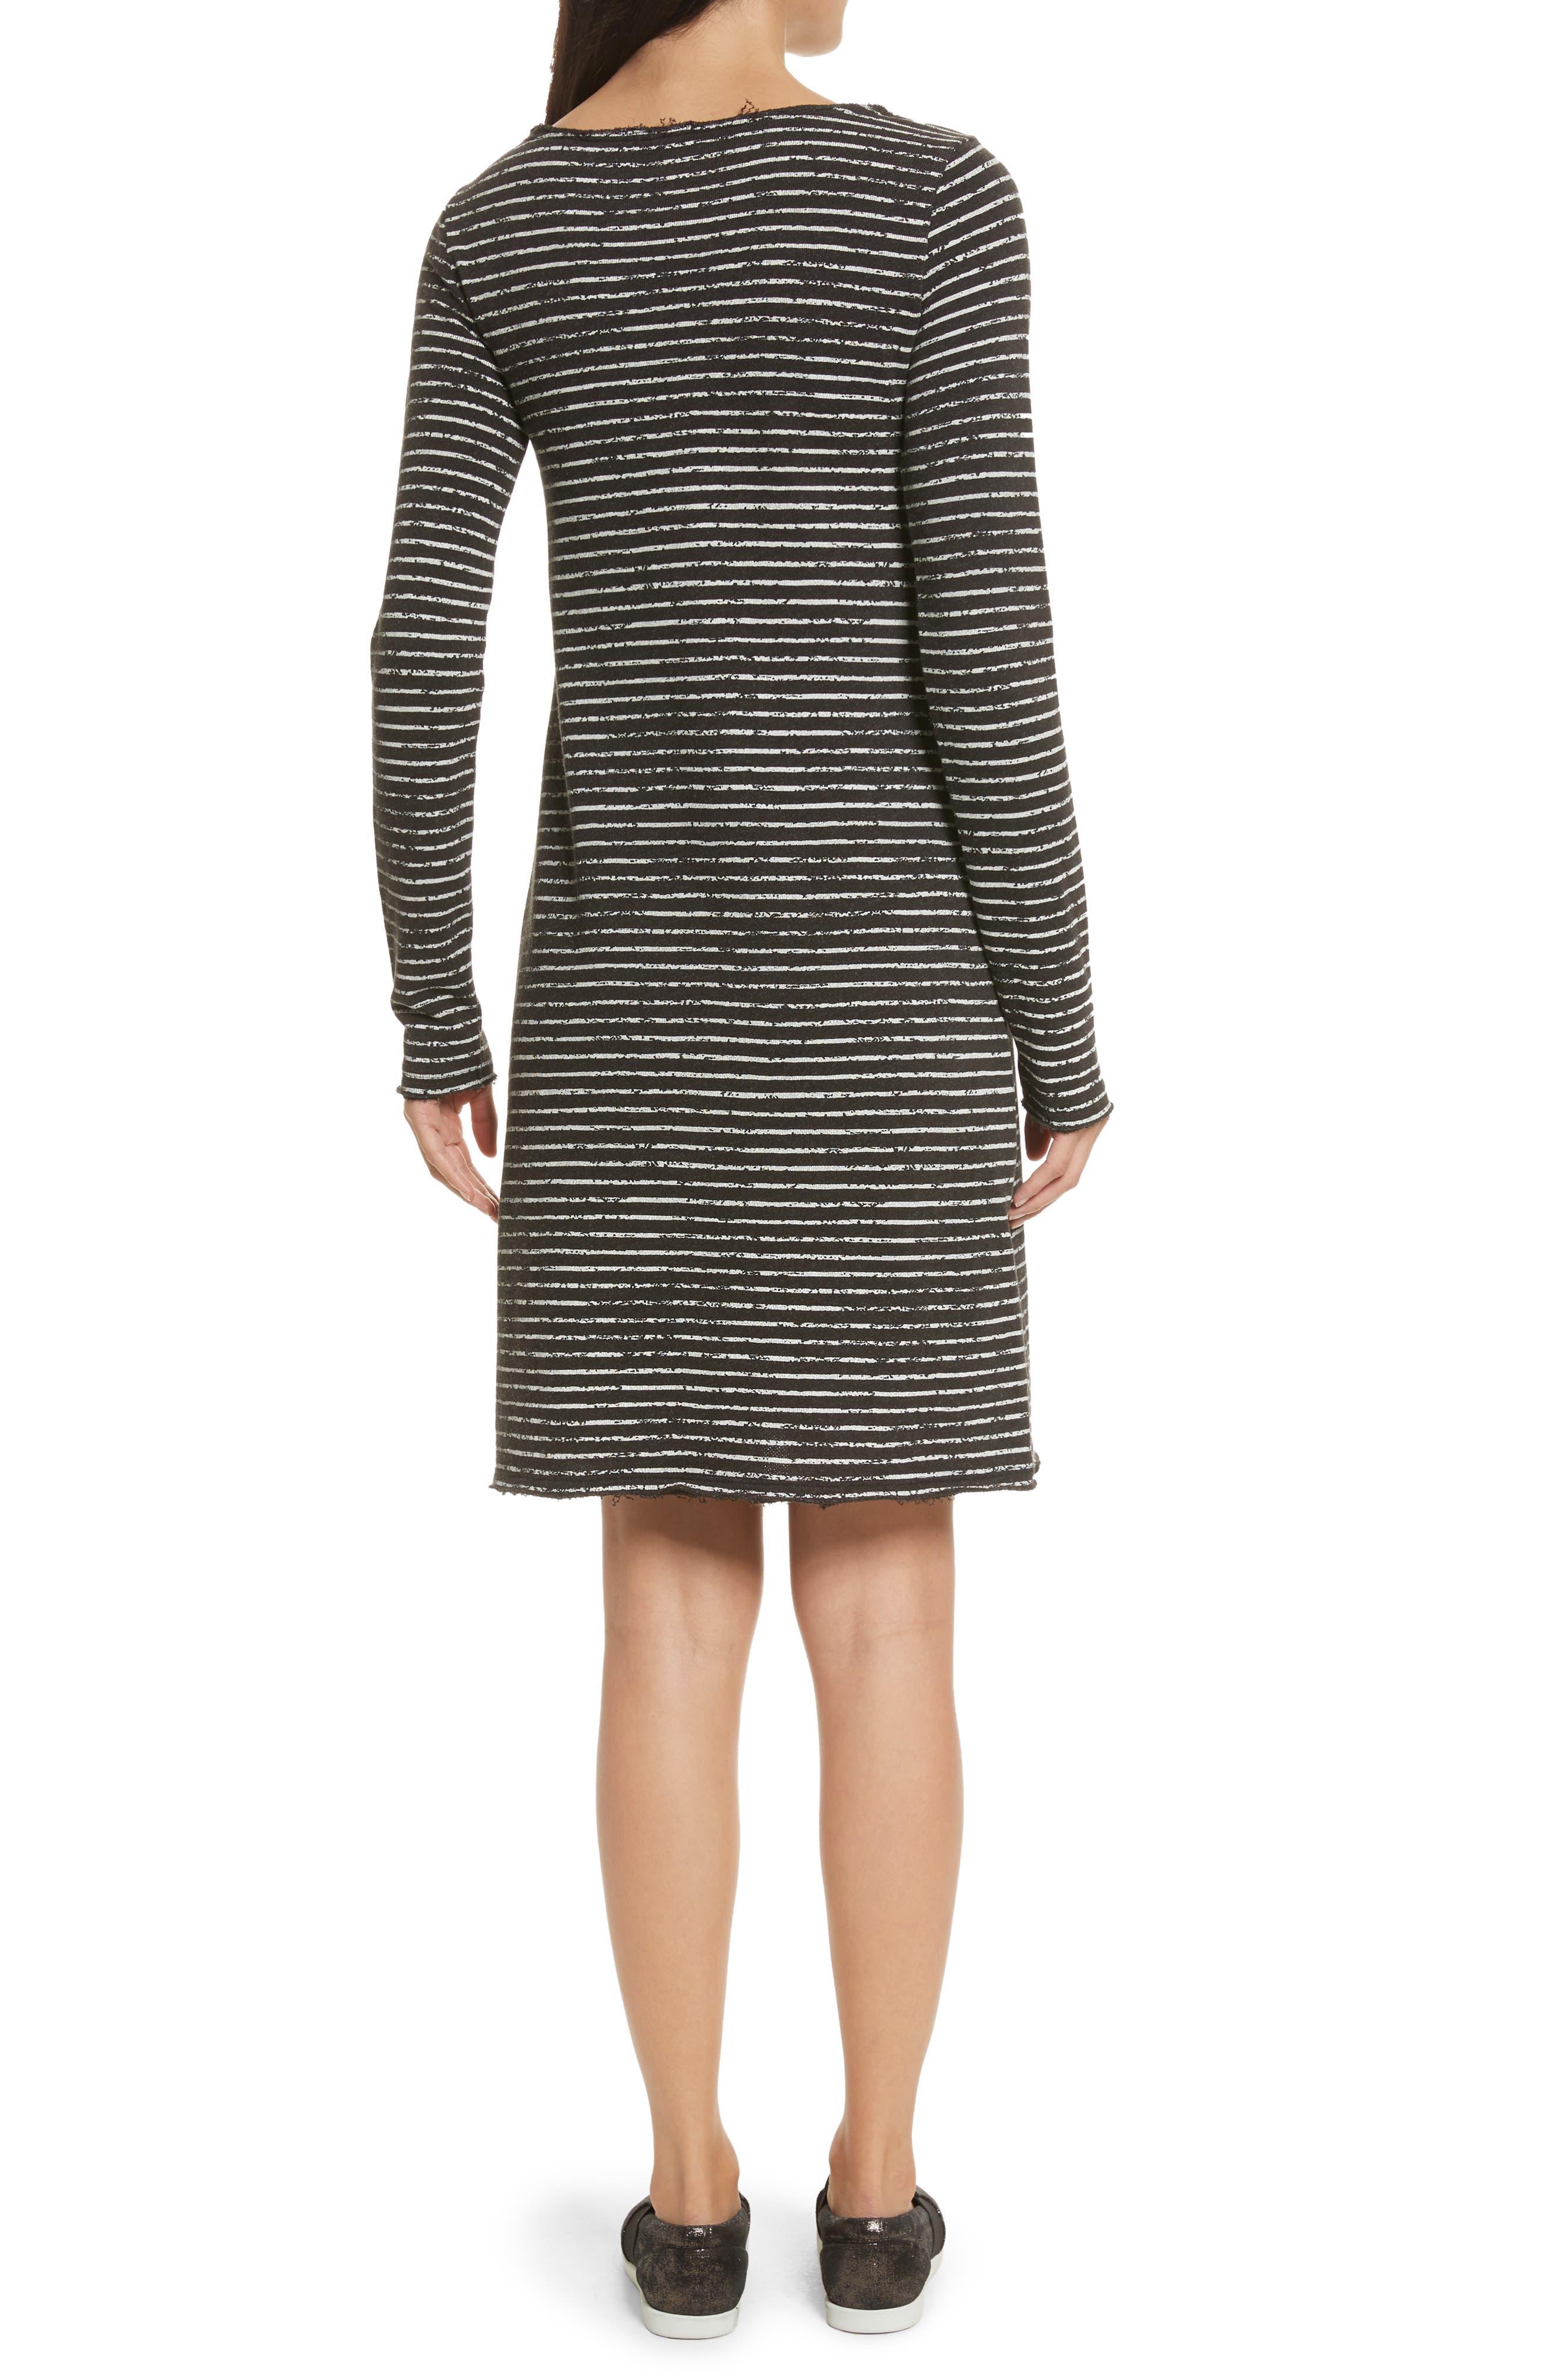 Broken Stripe French Terry Dress,                             Alternate thumbnail 2, color,                             Charcoal Combo Stripe